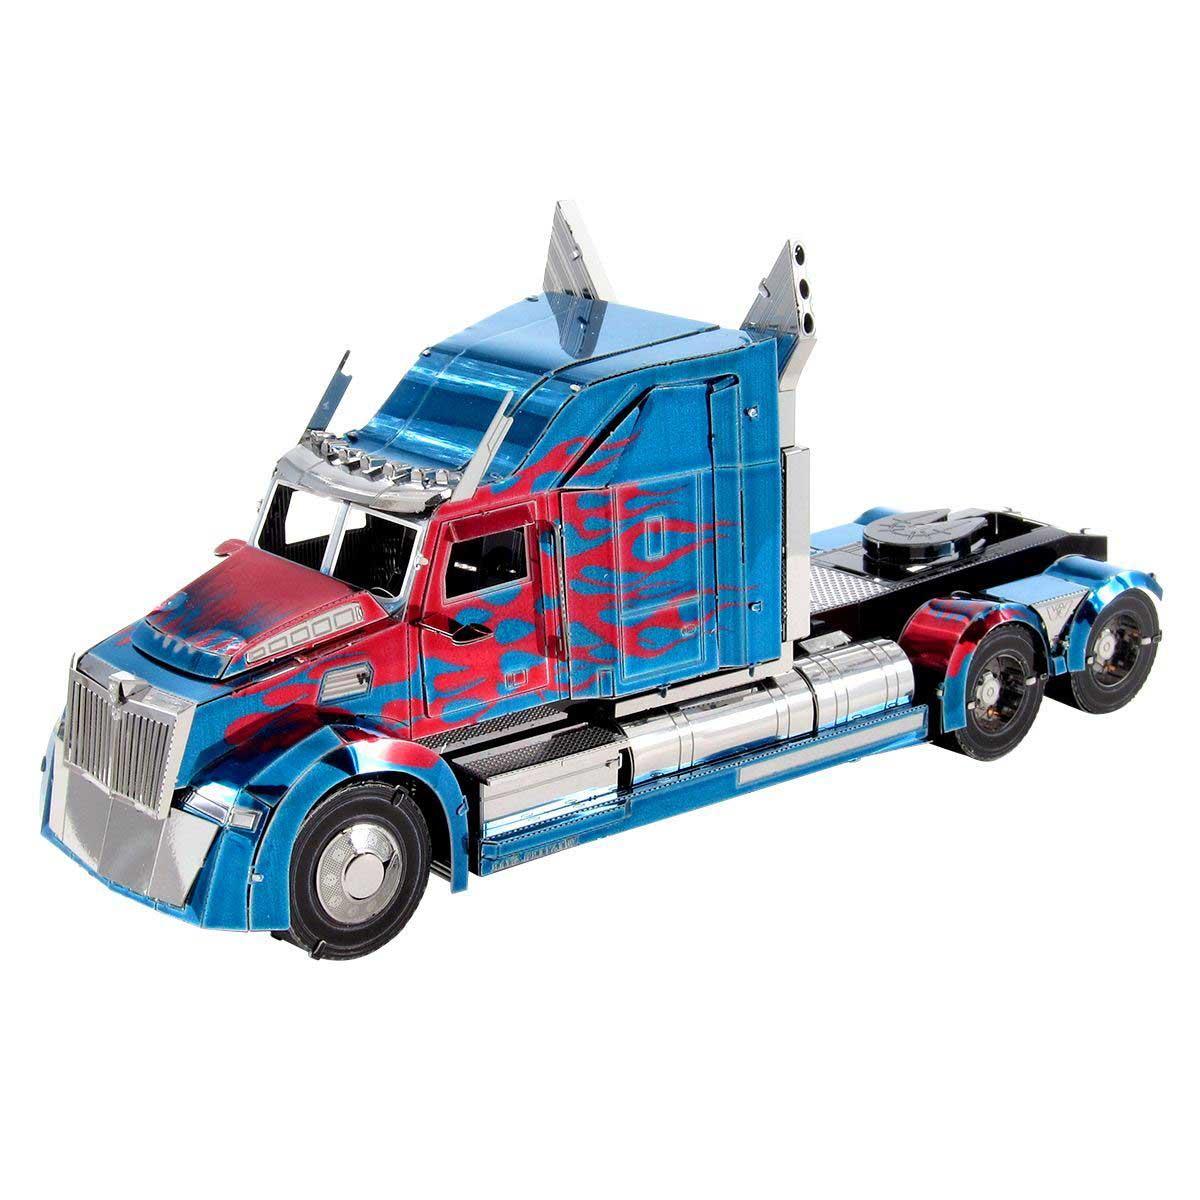 Optimus Prime Western Star 5700 Truck Cars Metal Puzzles